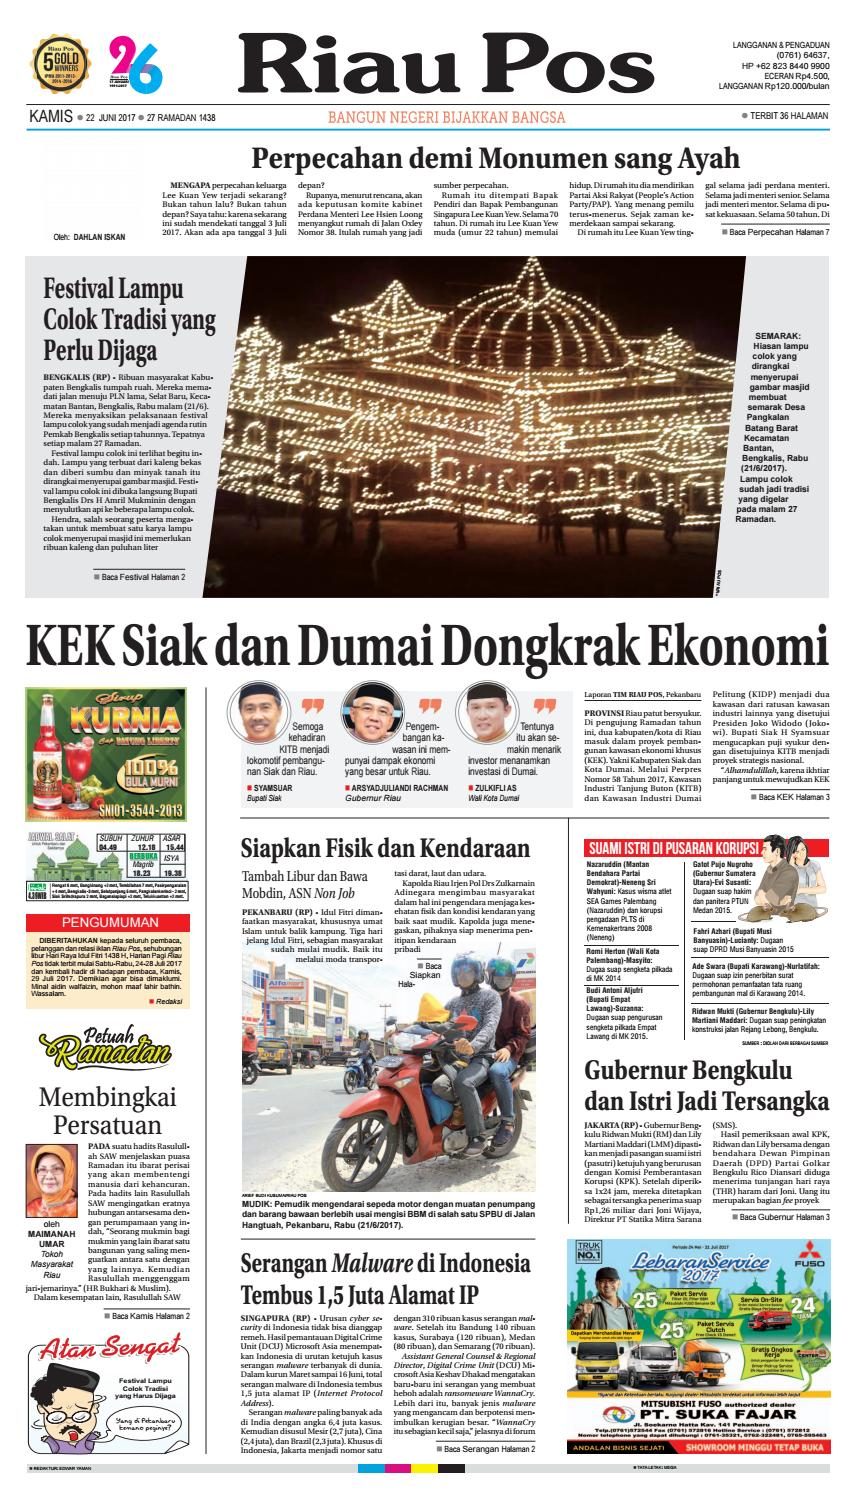 2017 06 22 By Riau Pos Issuu Produk Ukm Bumn Kue Sagu Ikan Haruan